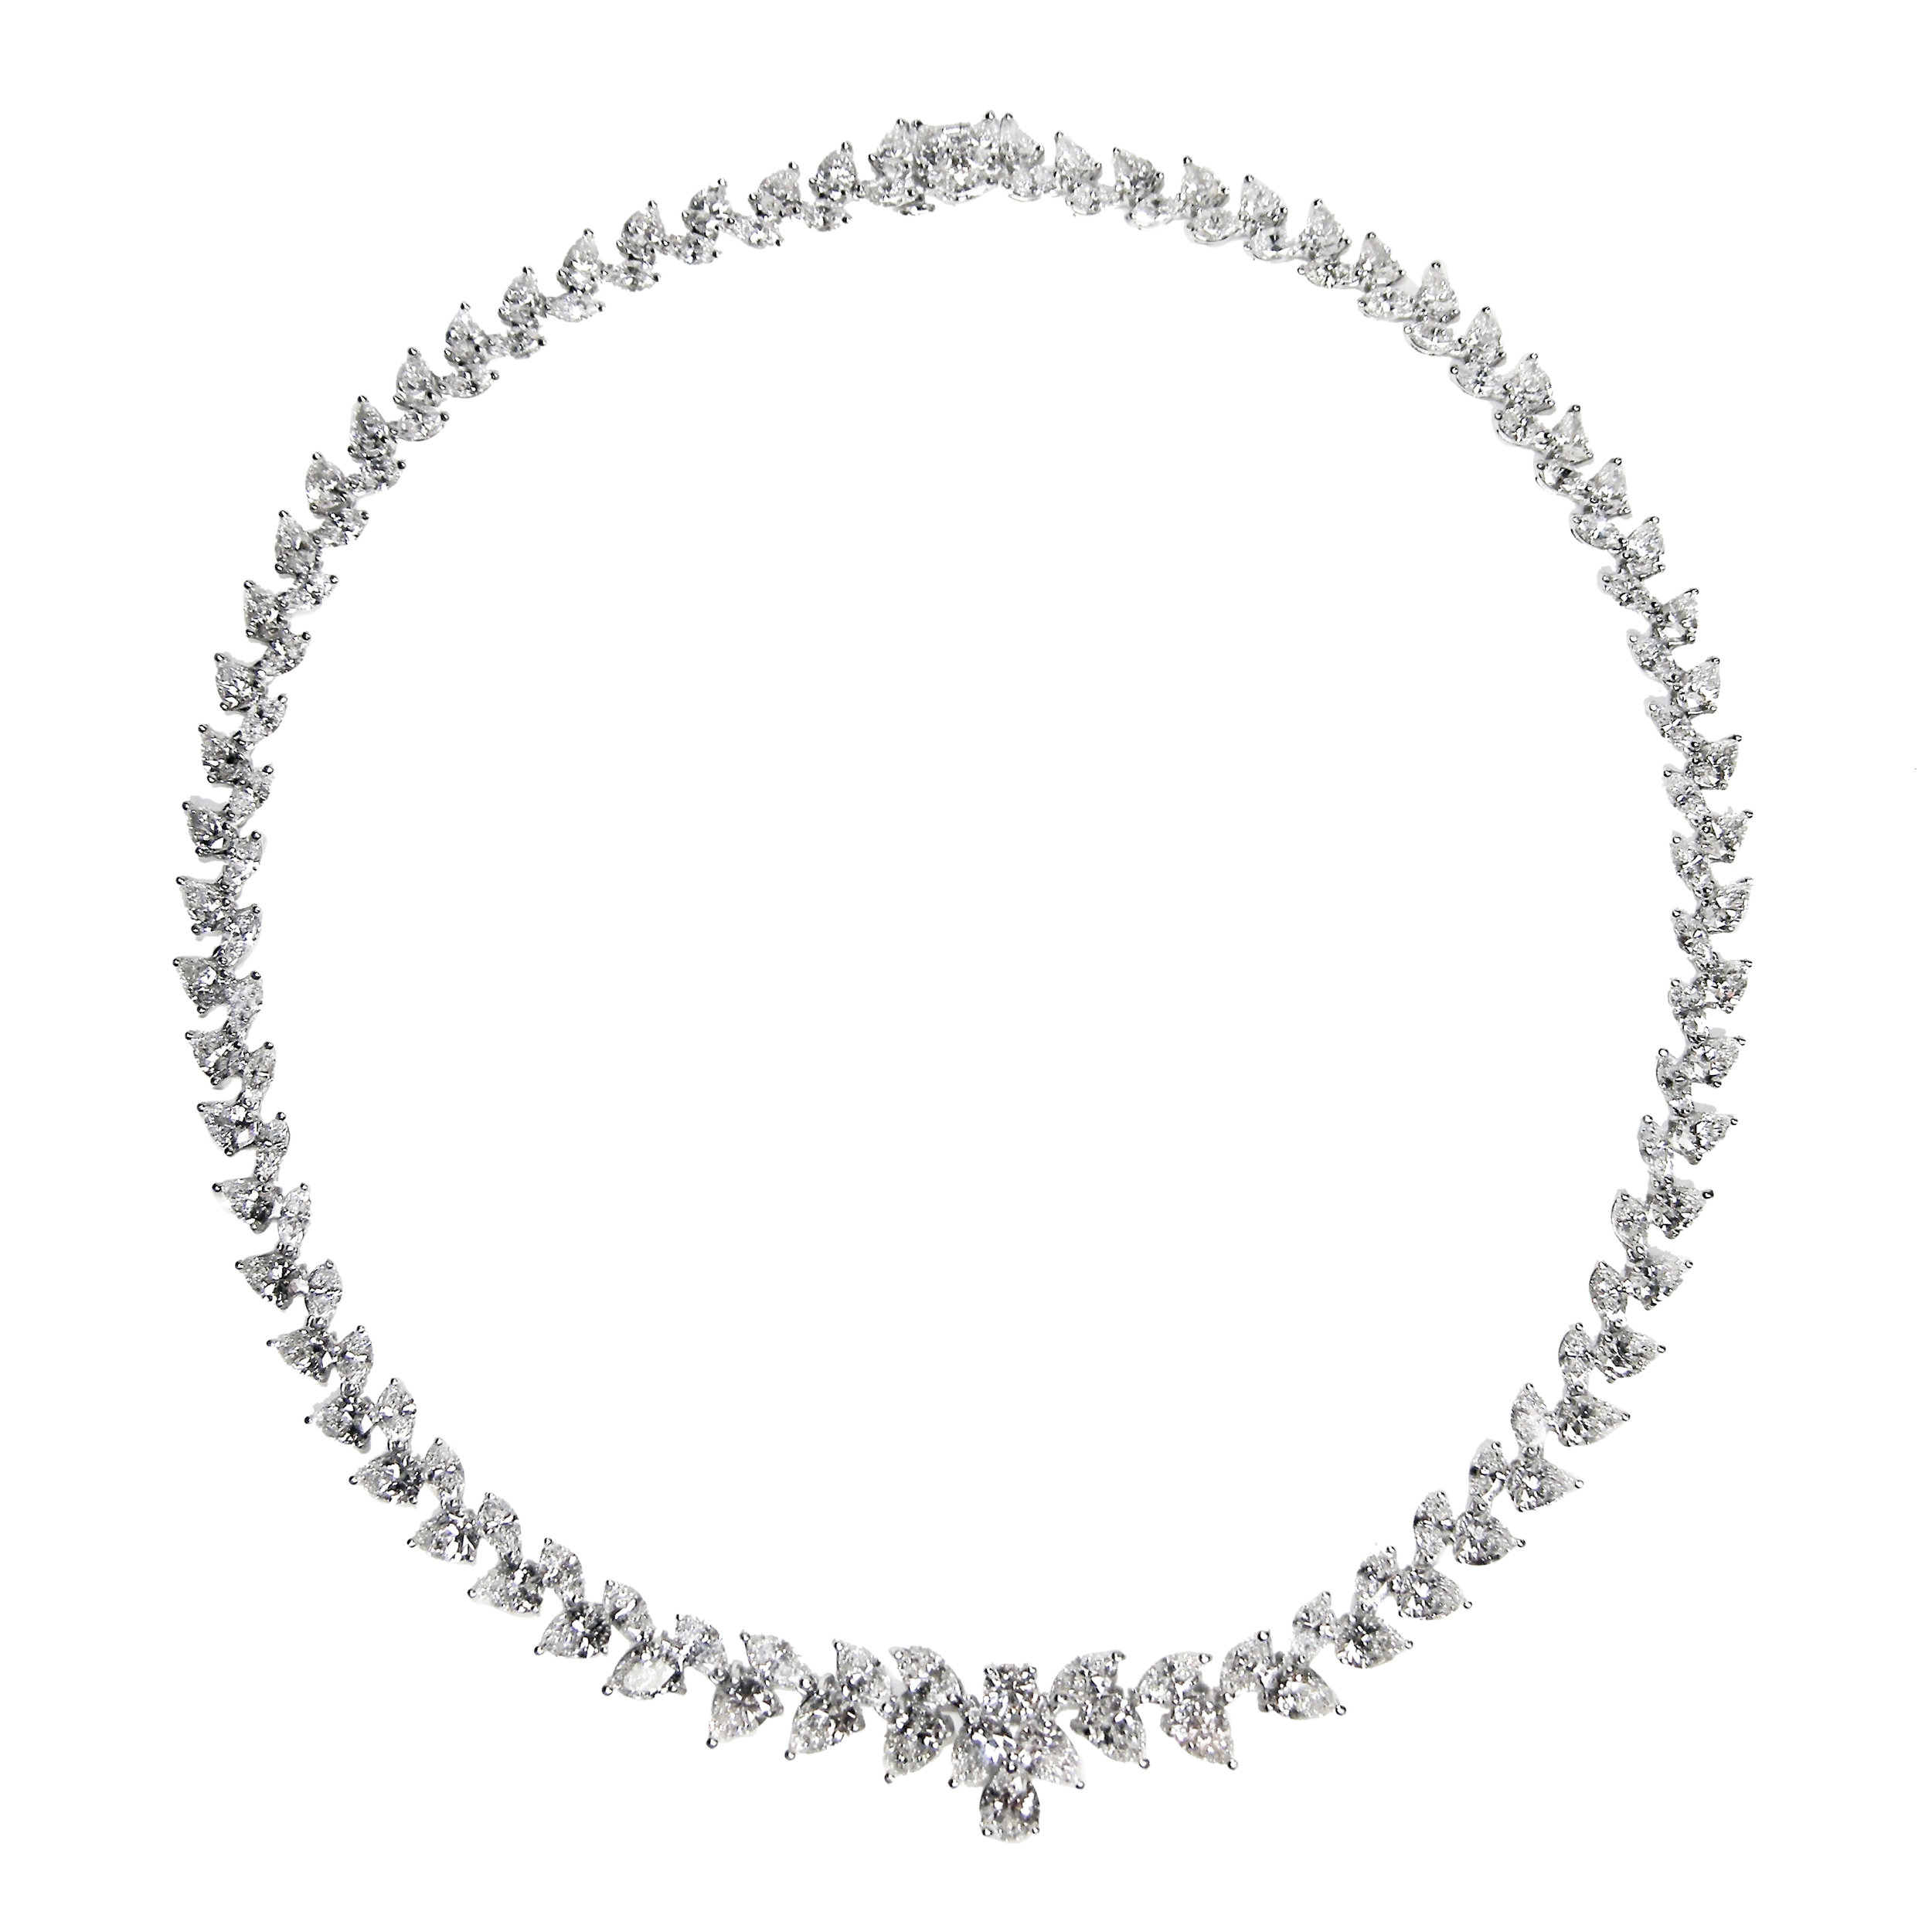 VINE DIAMOND NECKLACE BESPOKE FINE JEWELLERY BY SHAHINA HATTA